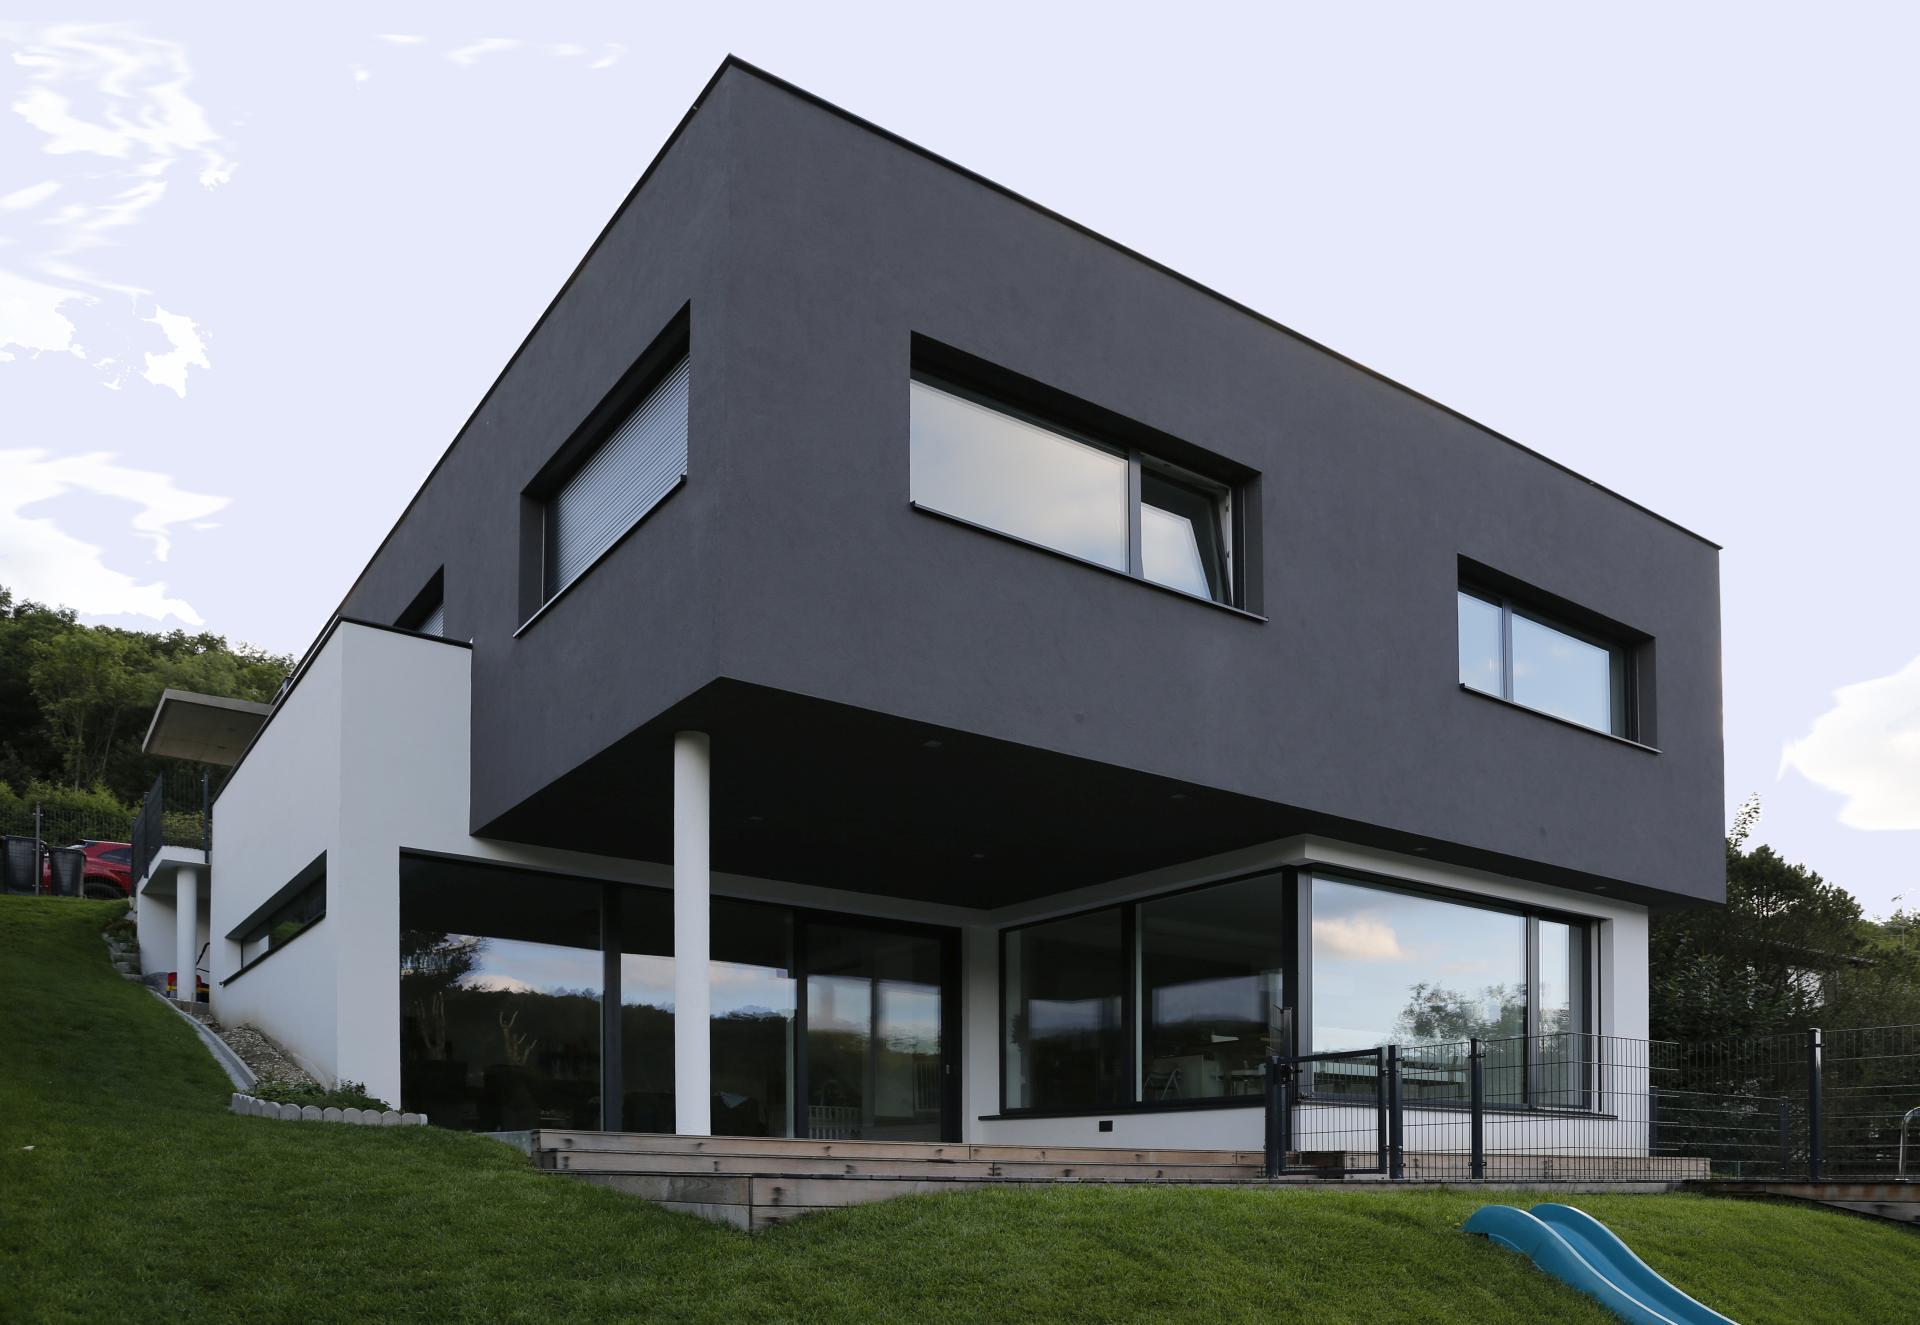 modernes einfamilienhaus bauen modernes domizil. Black Bedroom Furniture Sets. Home Design Ideas